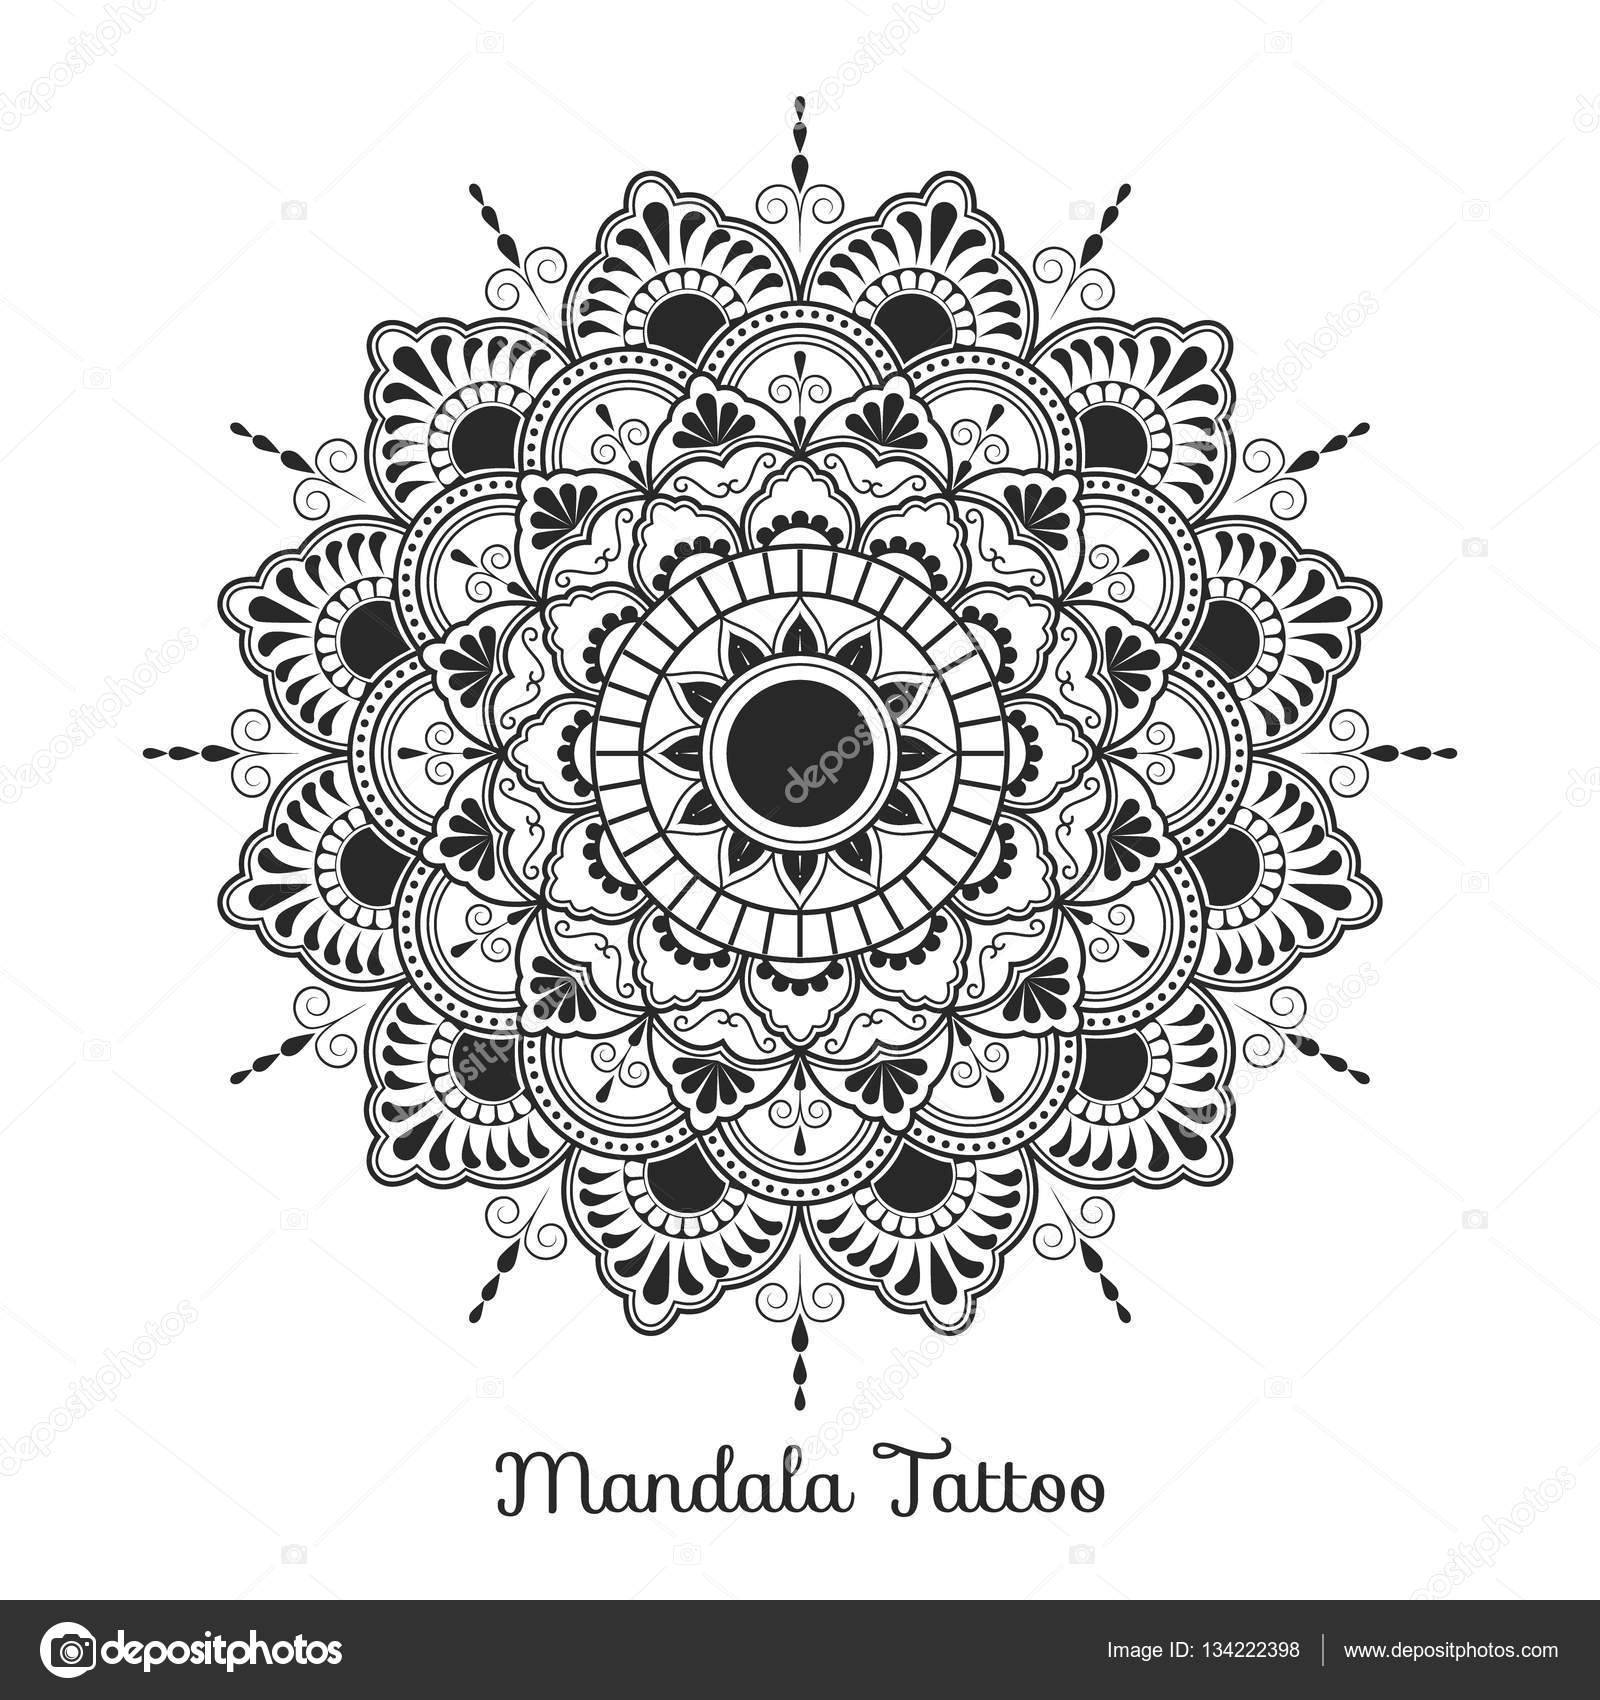 Dibujos Arabes Para Tatuajes Diseño De Mandala Adorno Decorativo